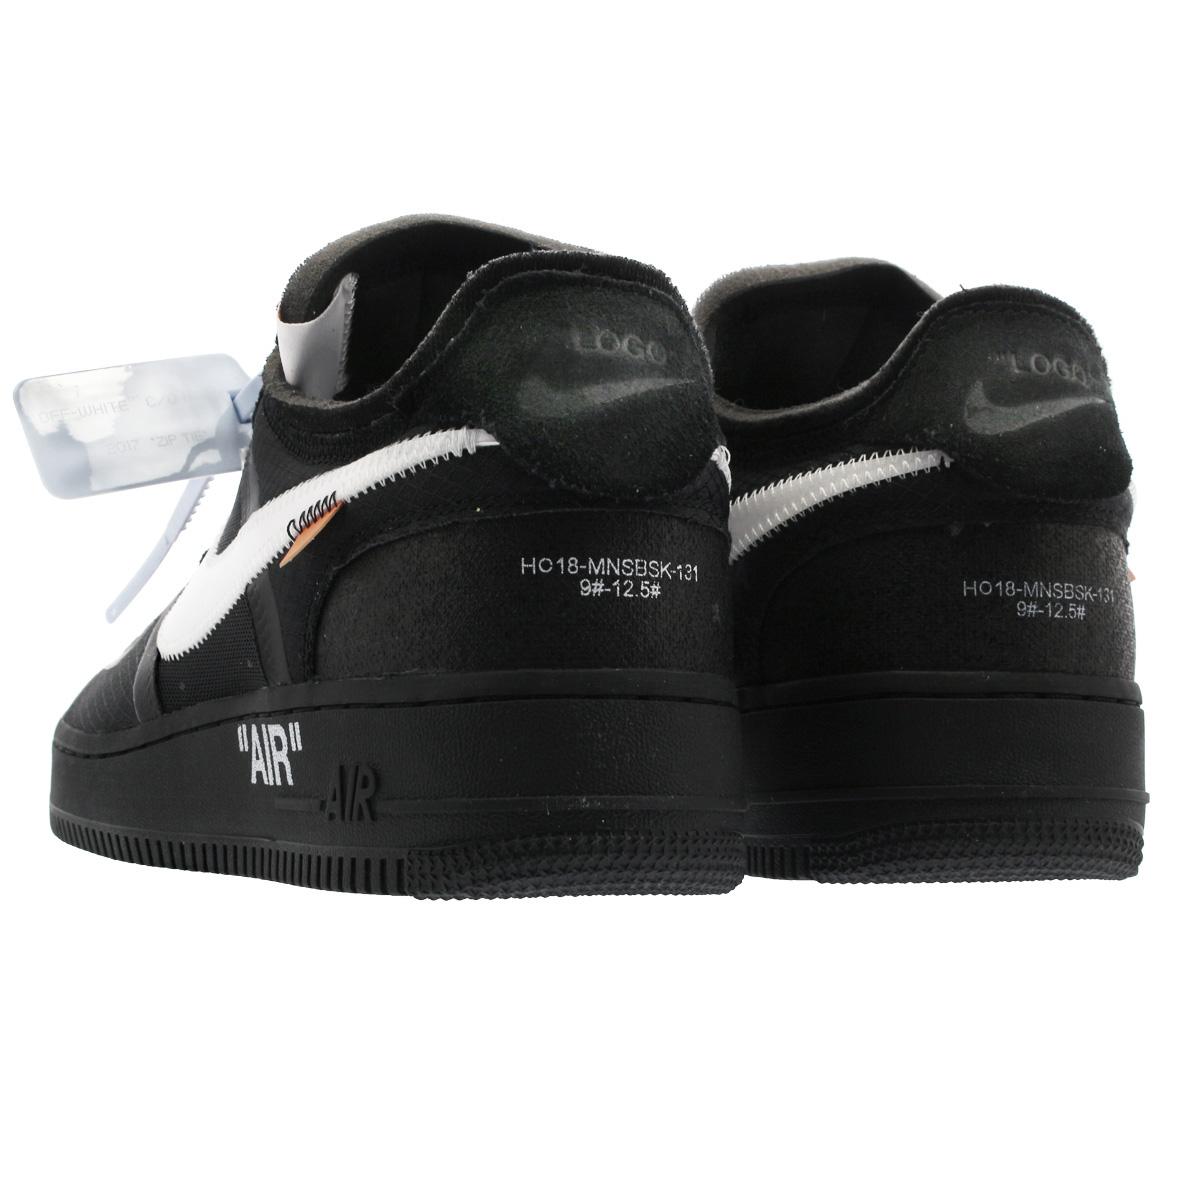 Off White x Nike Air Force 1 Low 'BlackWhite' AO4606 001